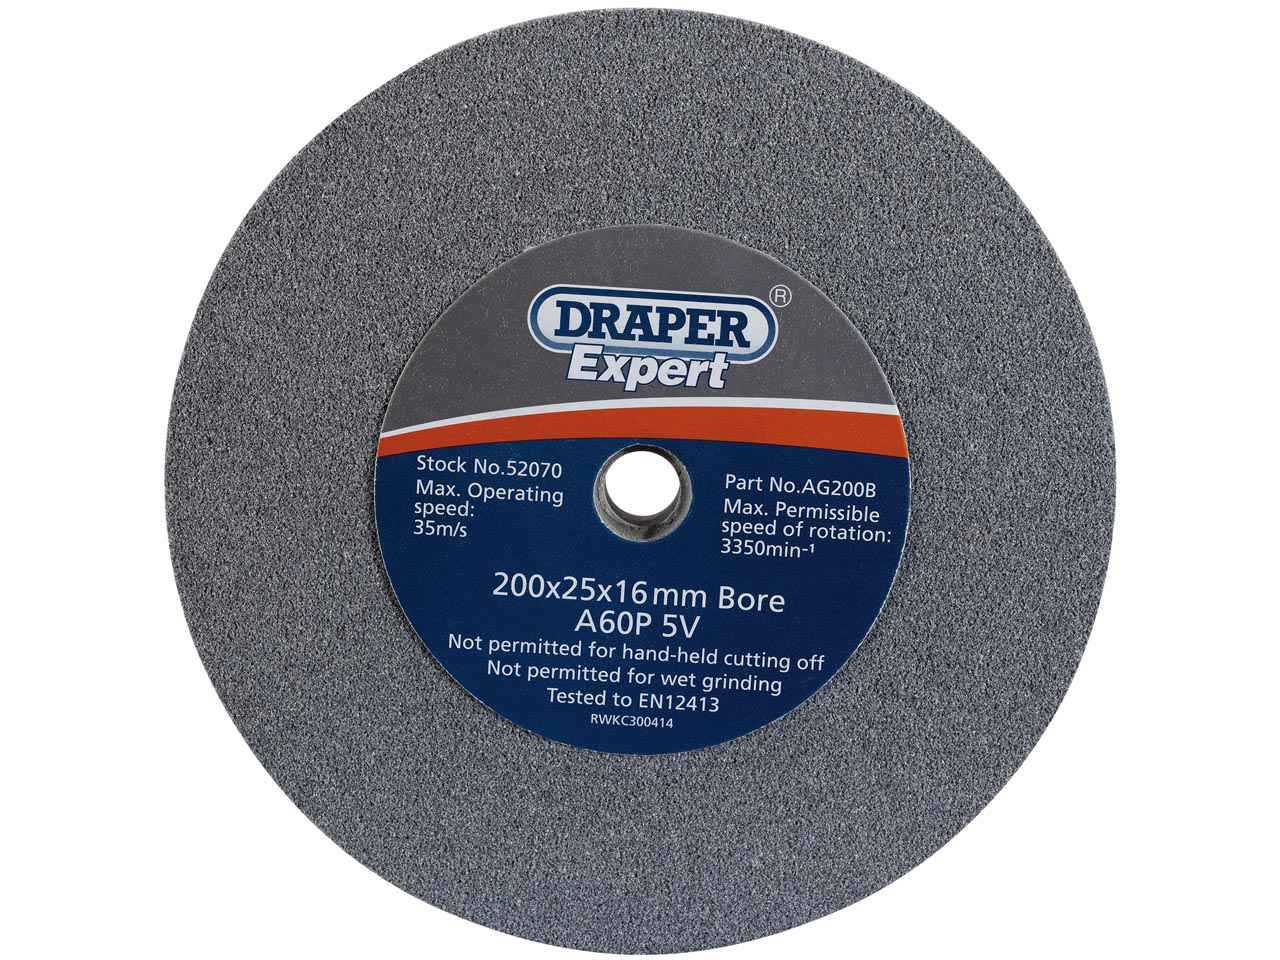 Silverline  390392 Aluminium Oxide Bench Grinding Wheel 150 x 20mm Medium